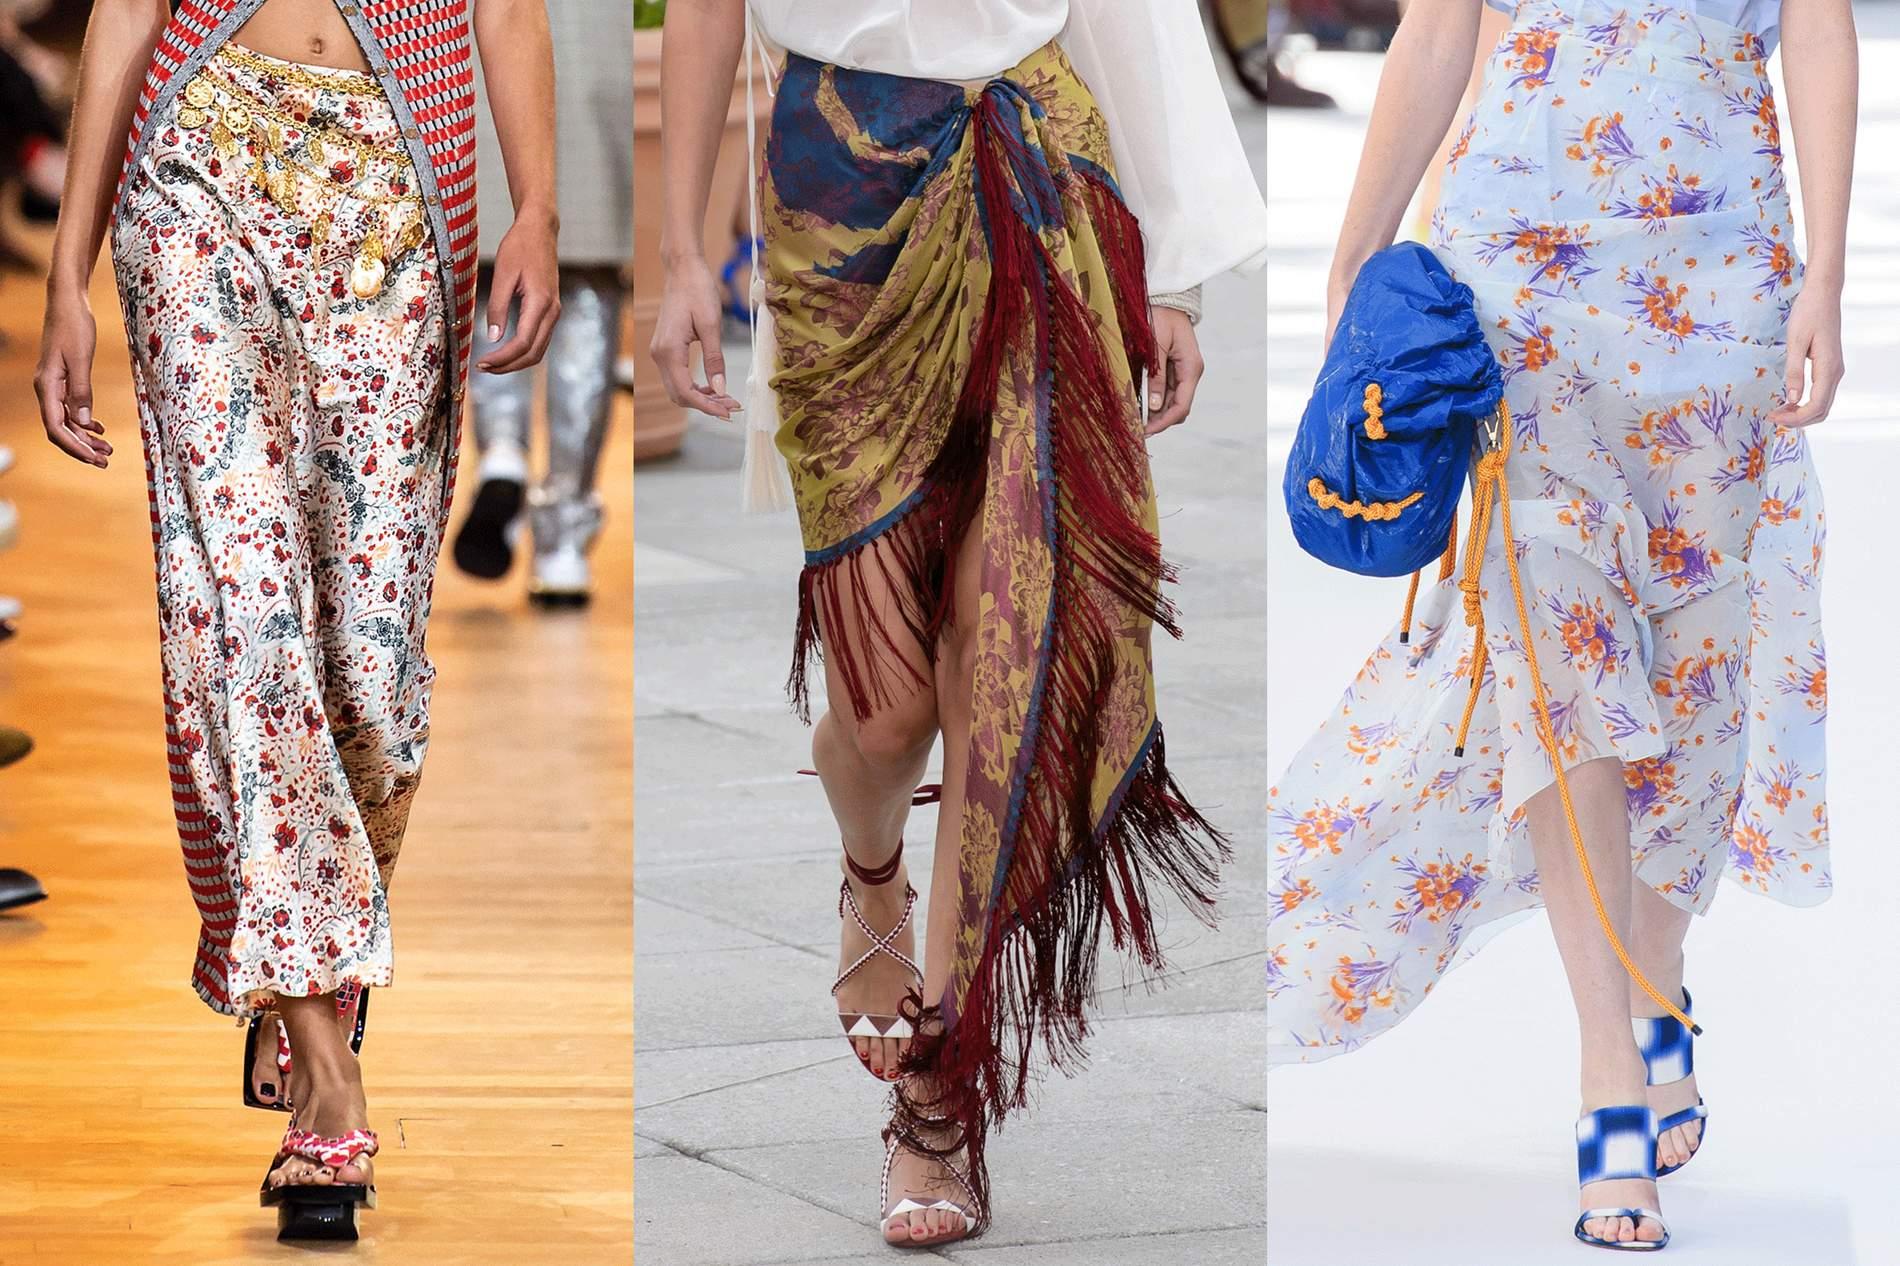 b4571b3abcb6 Incredible Women. Incredible Fashion. Every Day.